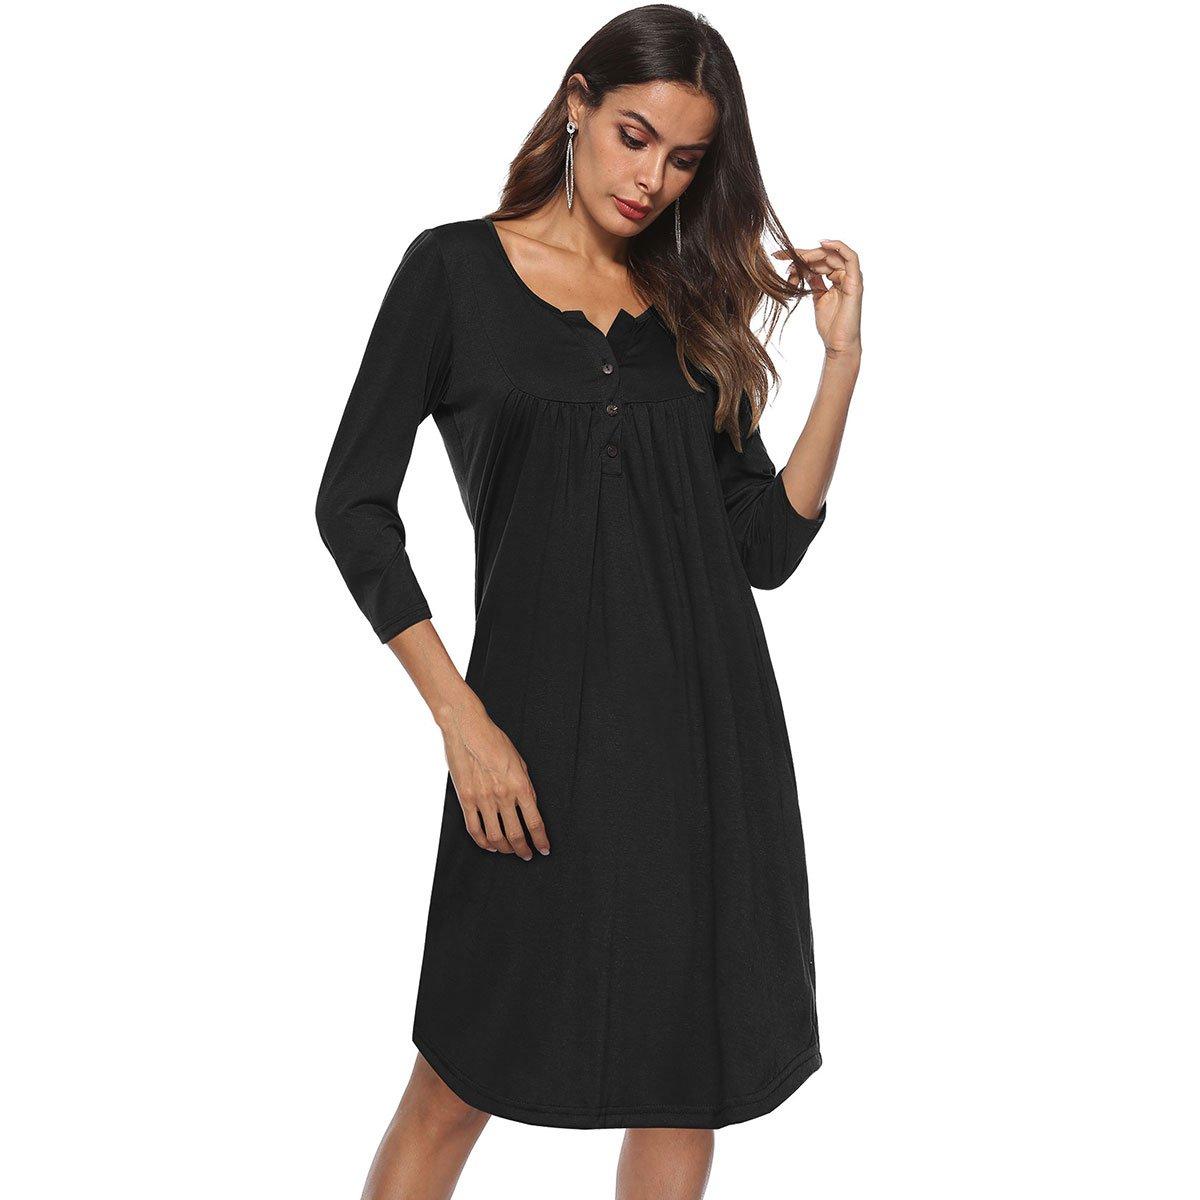 b8f2b967e82 Amazon.com  Greentree Women s Button up 3 4 Sleeve Casual Swing Simple  Loose T-Shirt Dress  Clothing